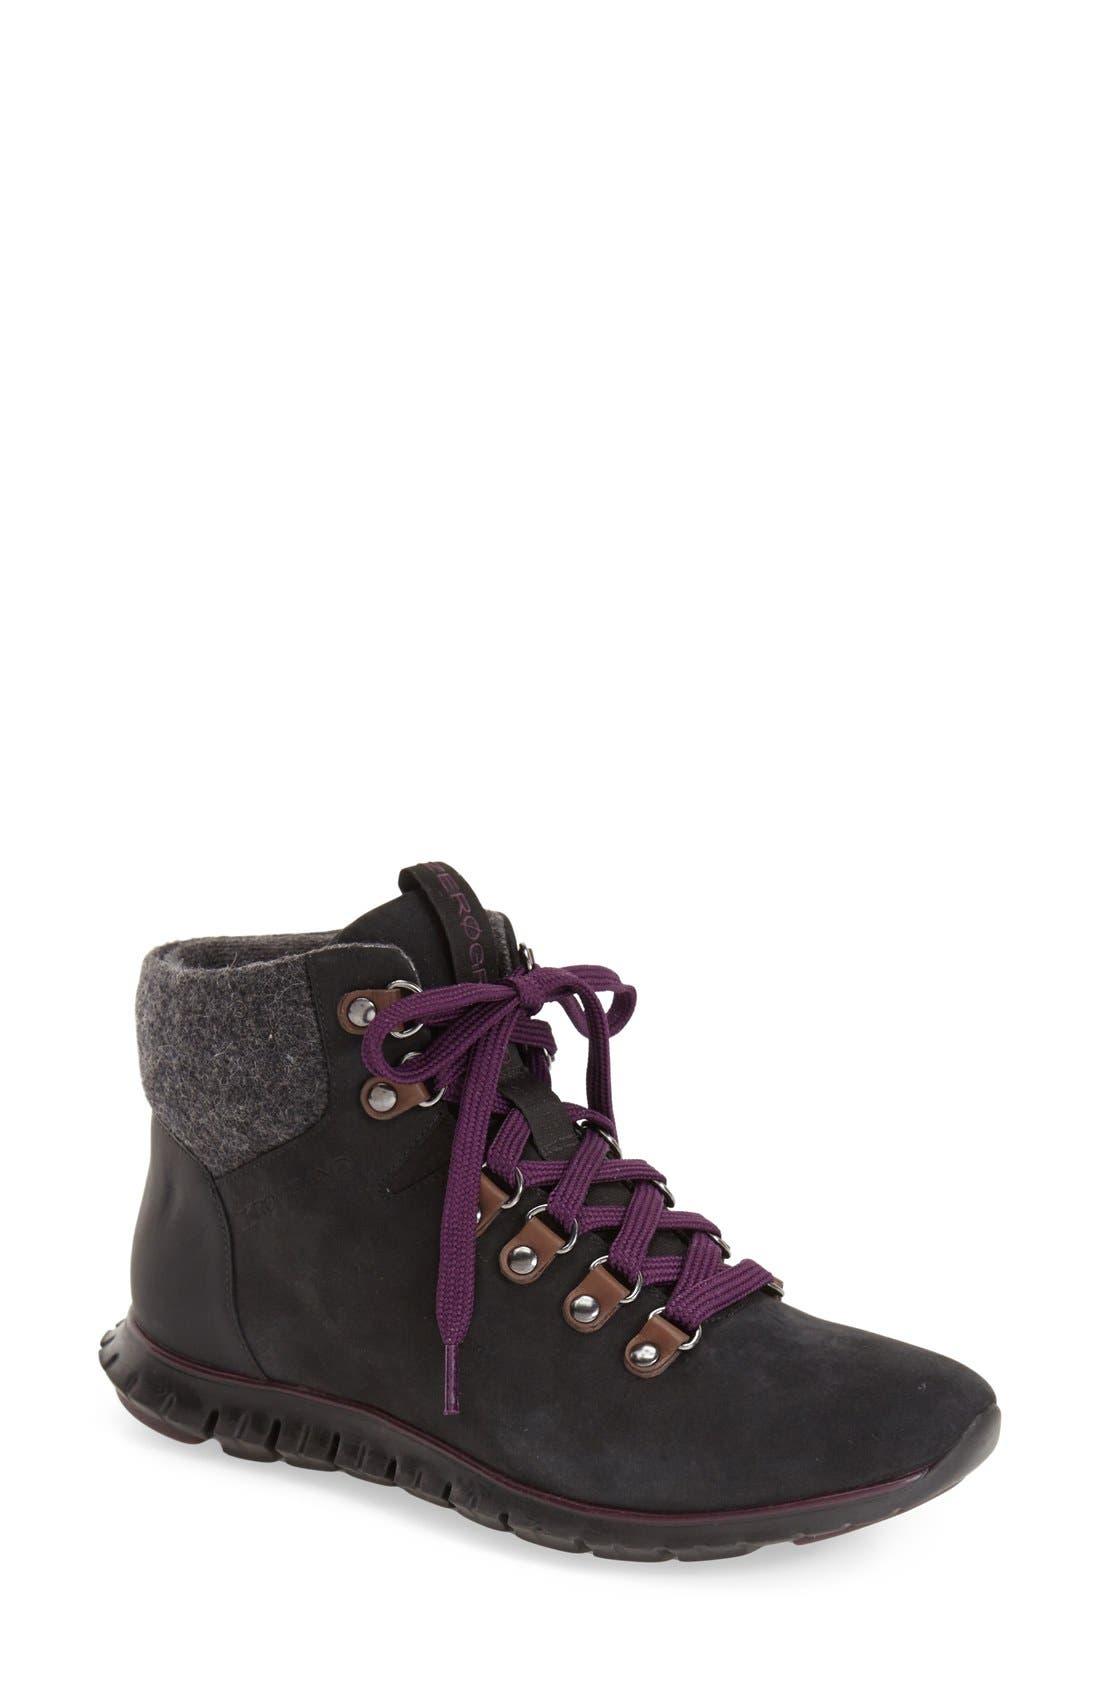 'ZerøGrand' Waterproof Hiking Boot, Main, color, 001